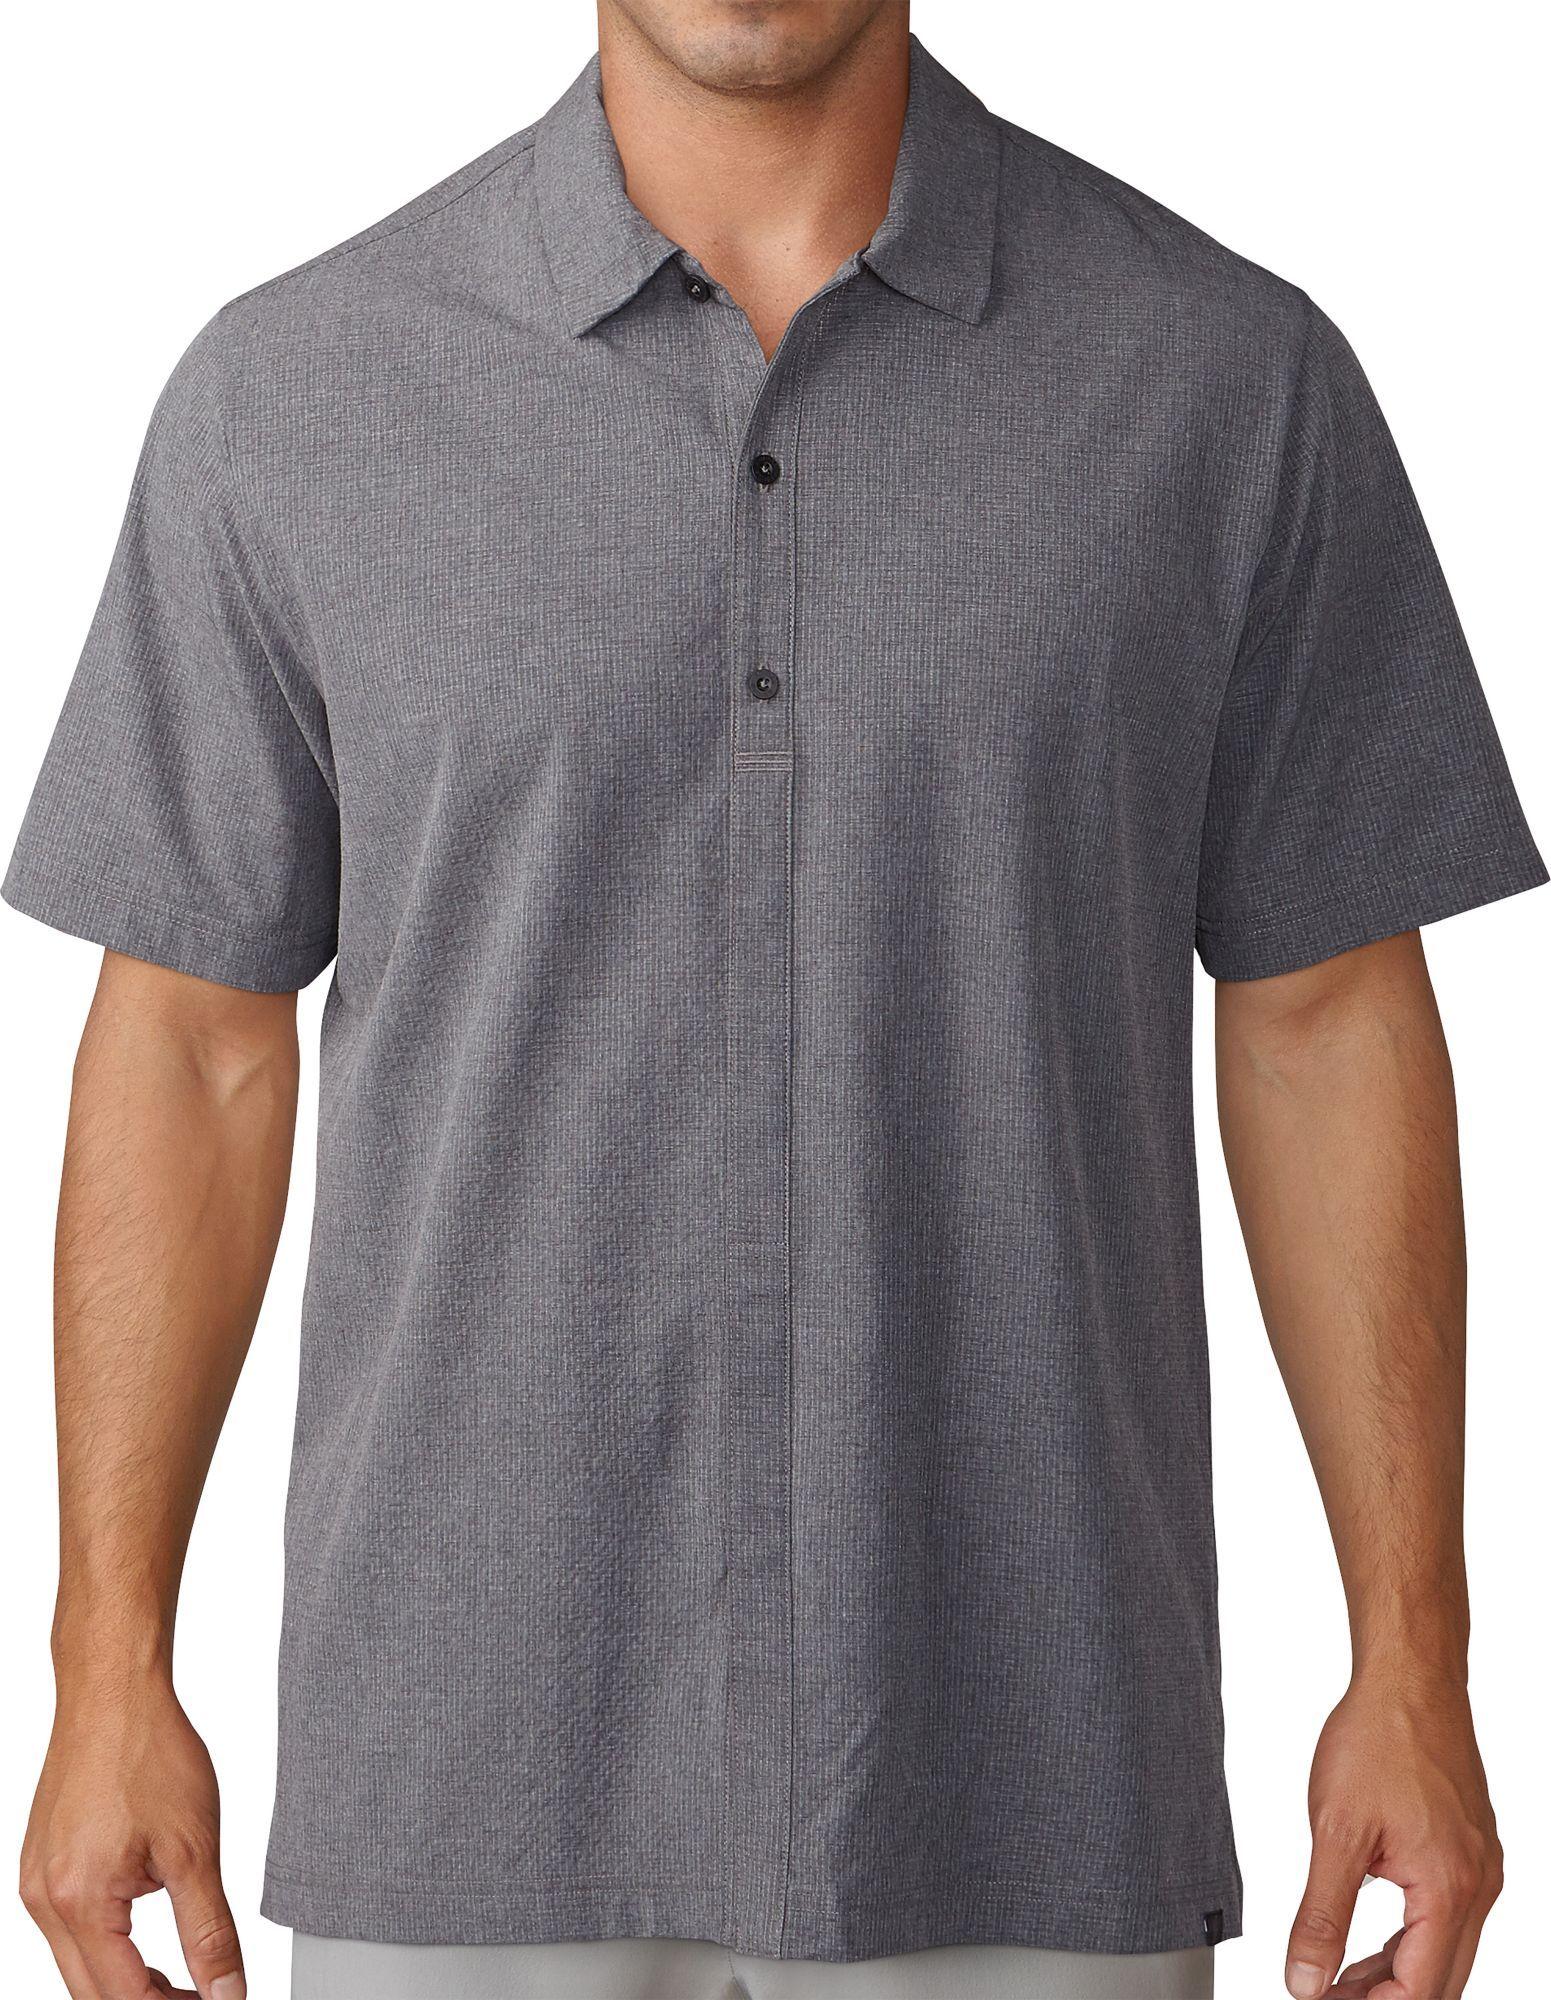 8c818f2486efe adidas Men's Adicross Woven Oxford Short Sleeve Golf Shirt, Size ...